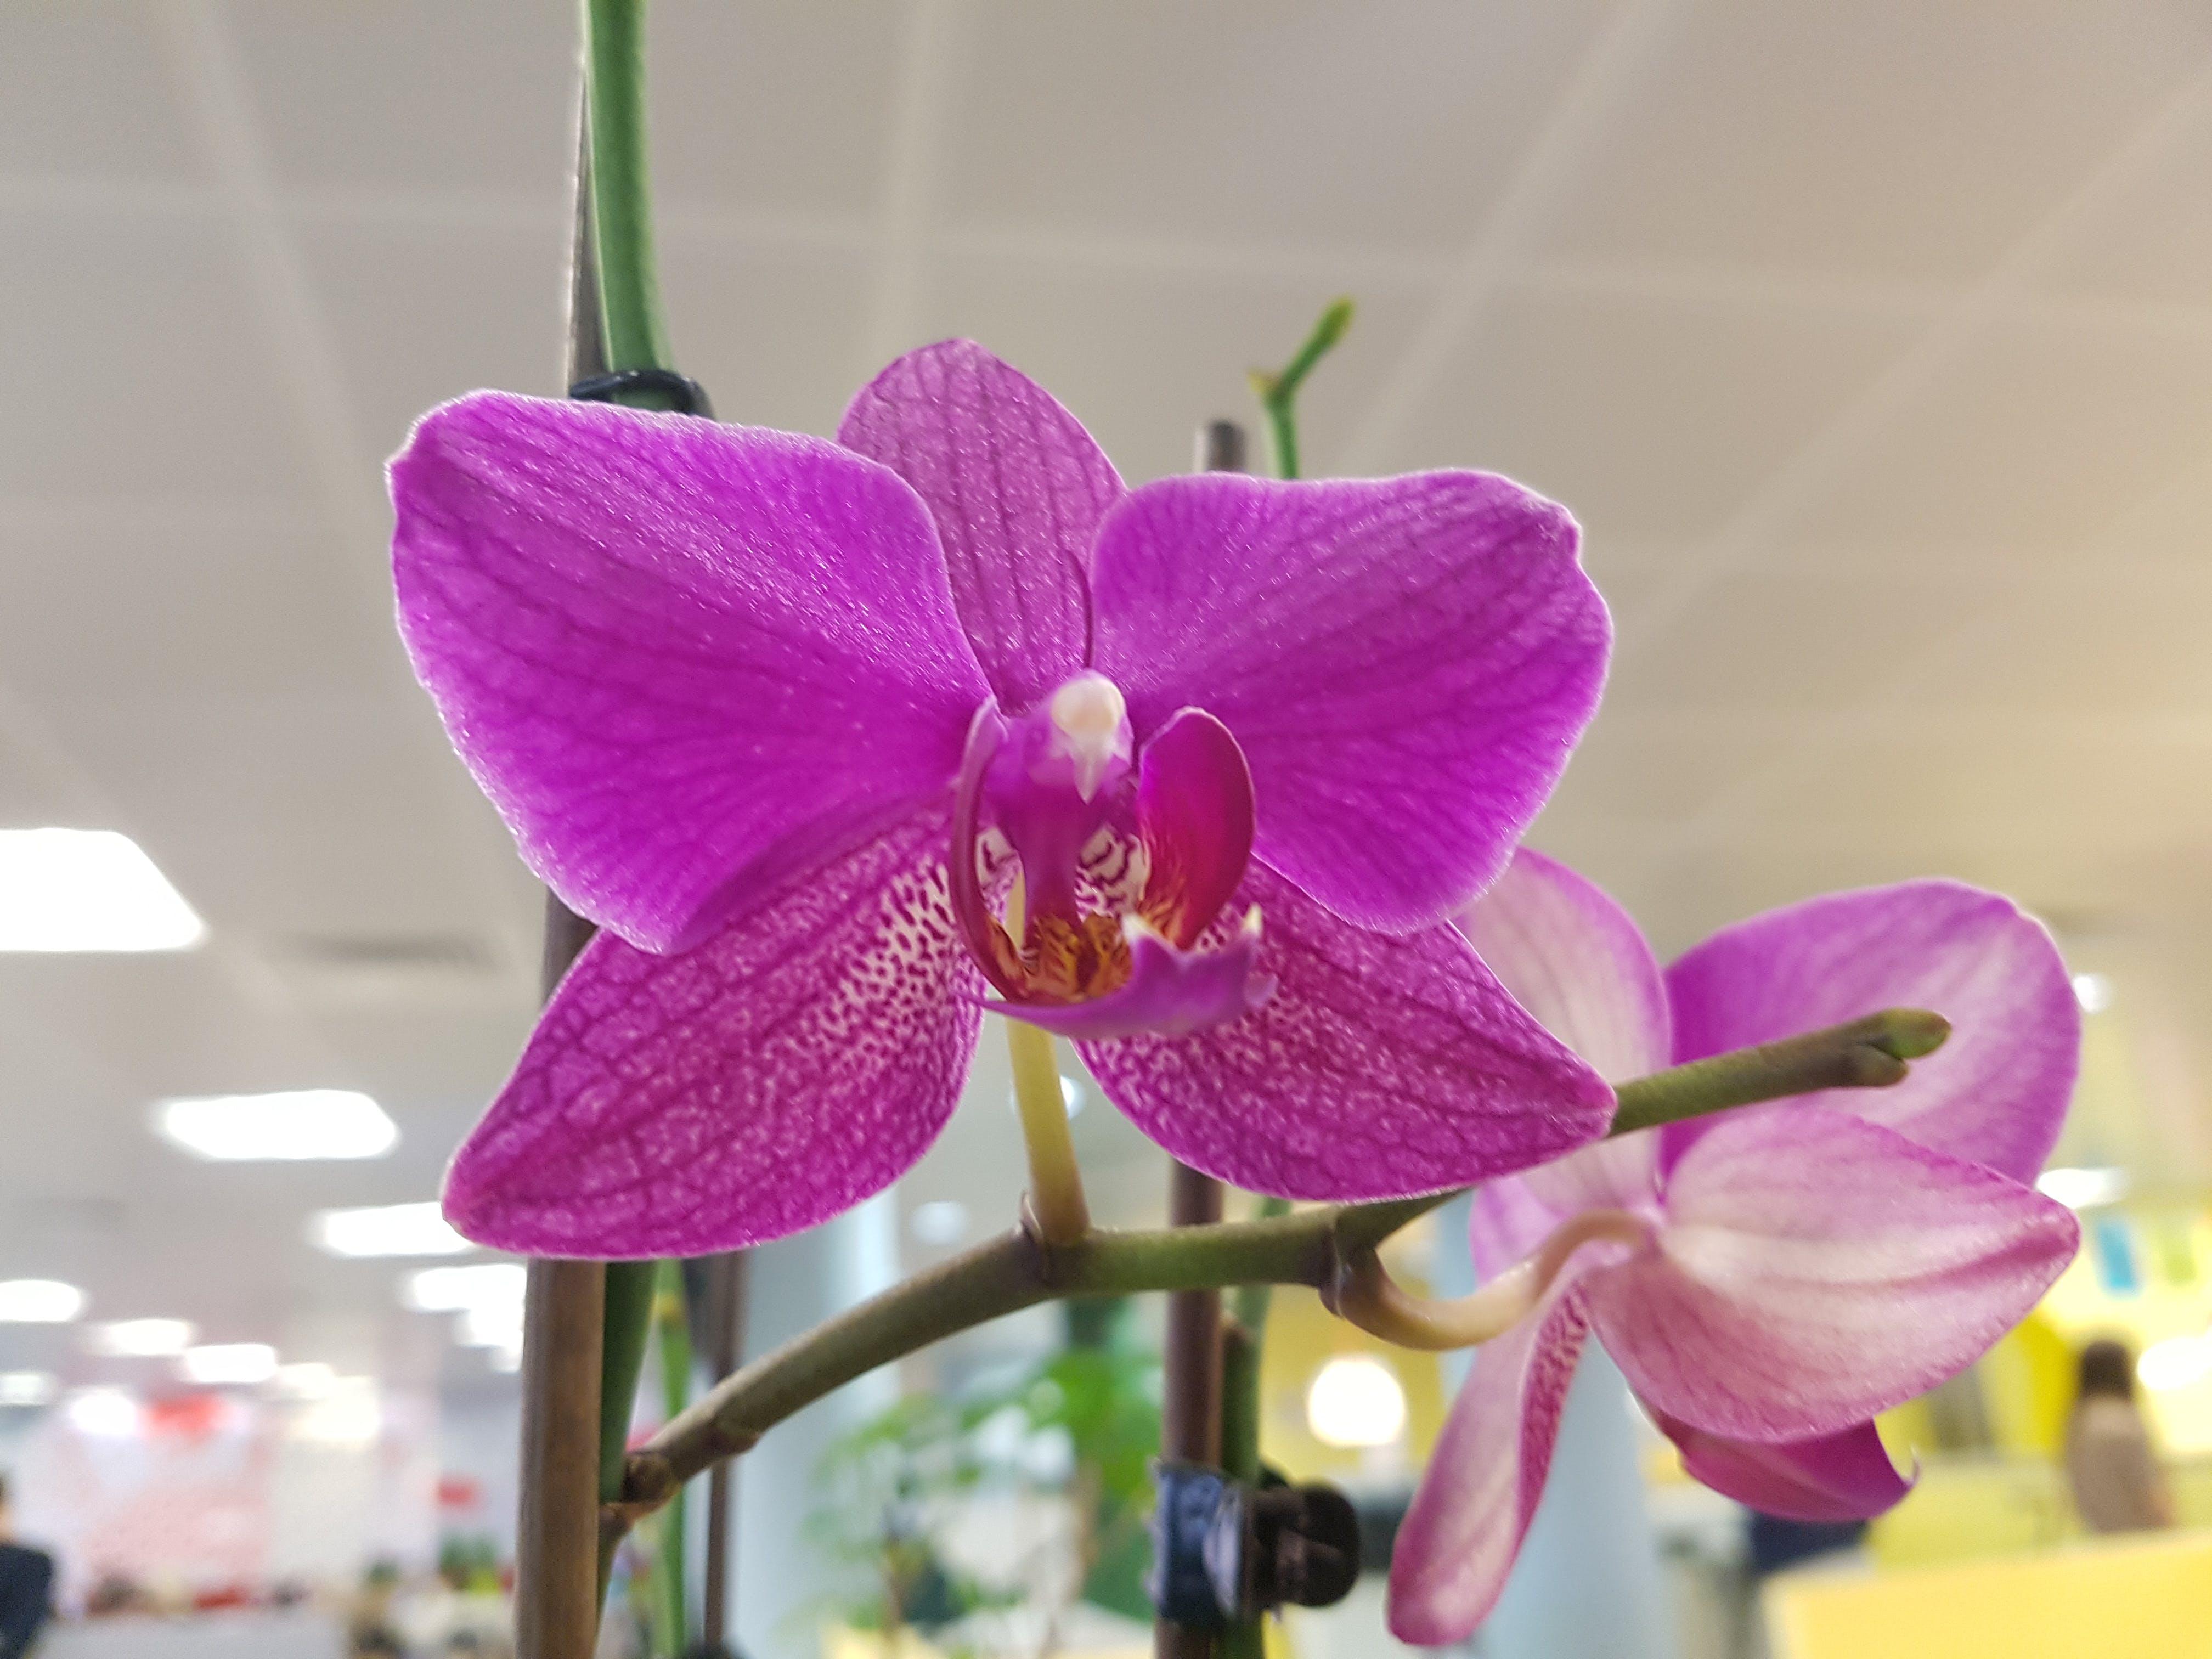 Free stock photo of office plants urban art flowers